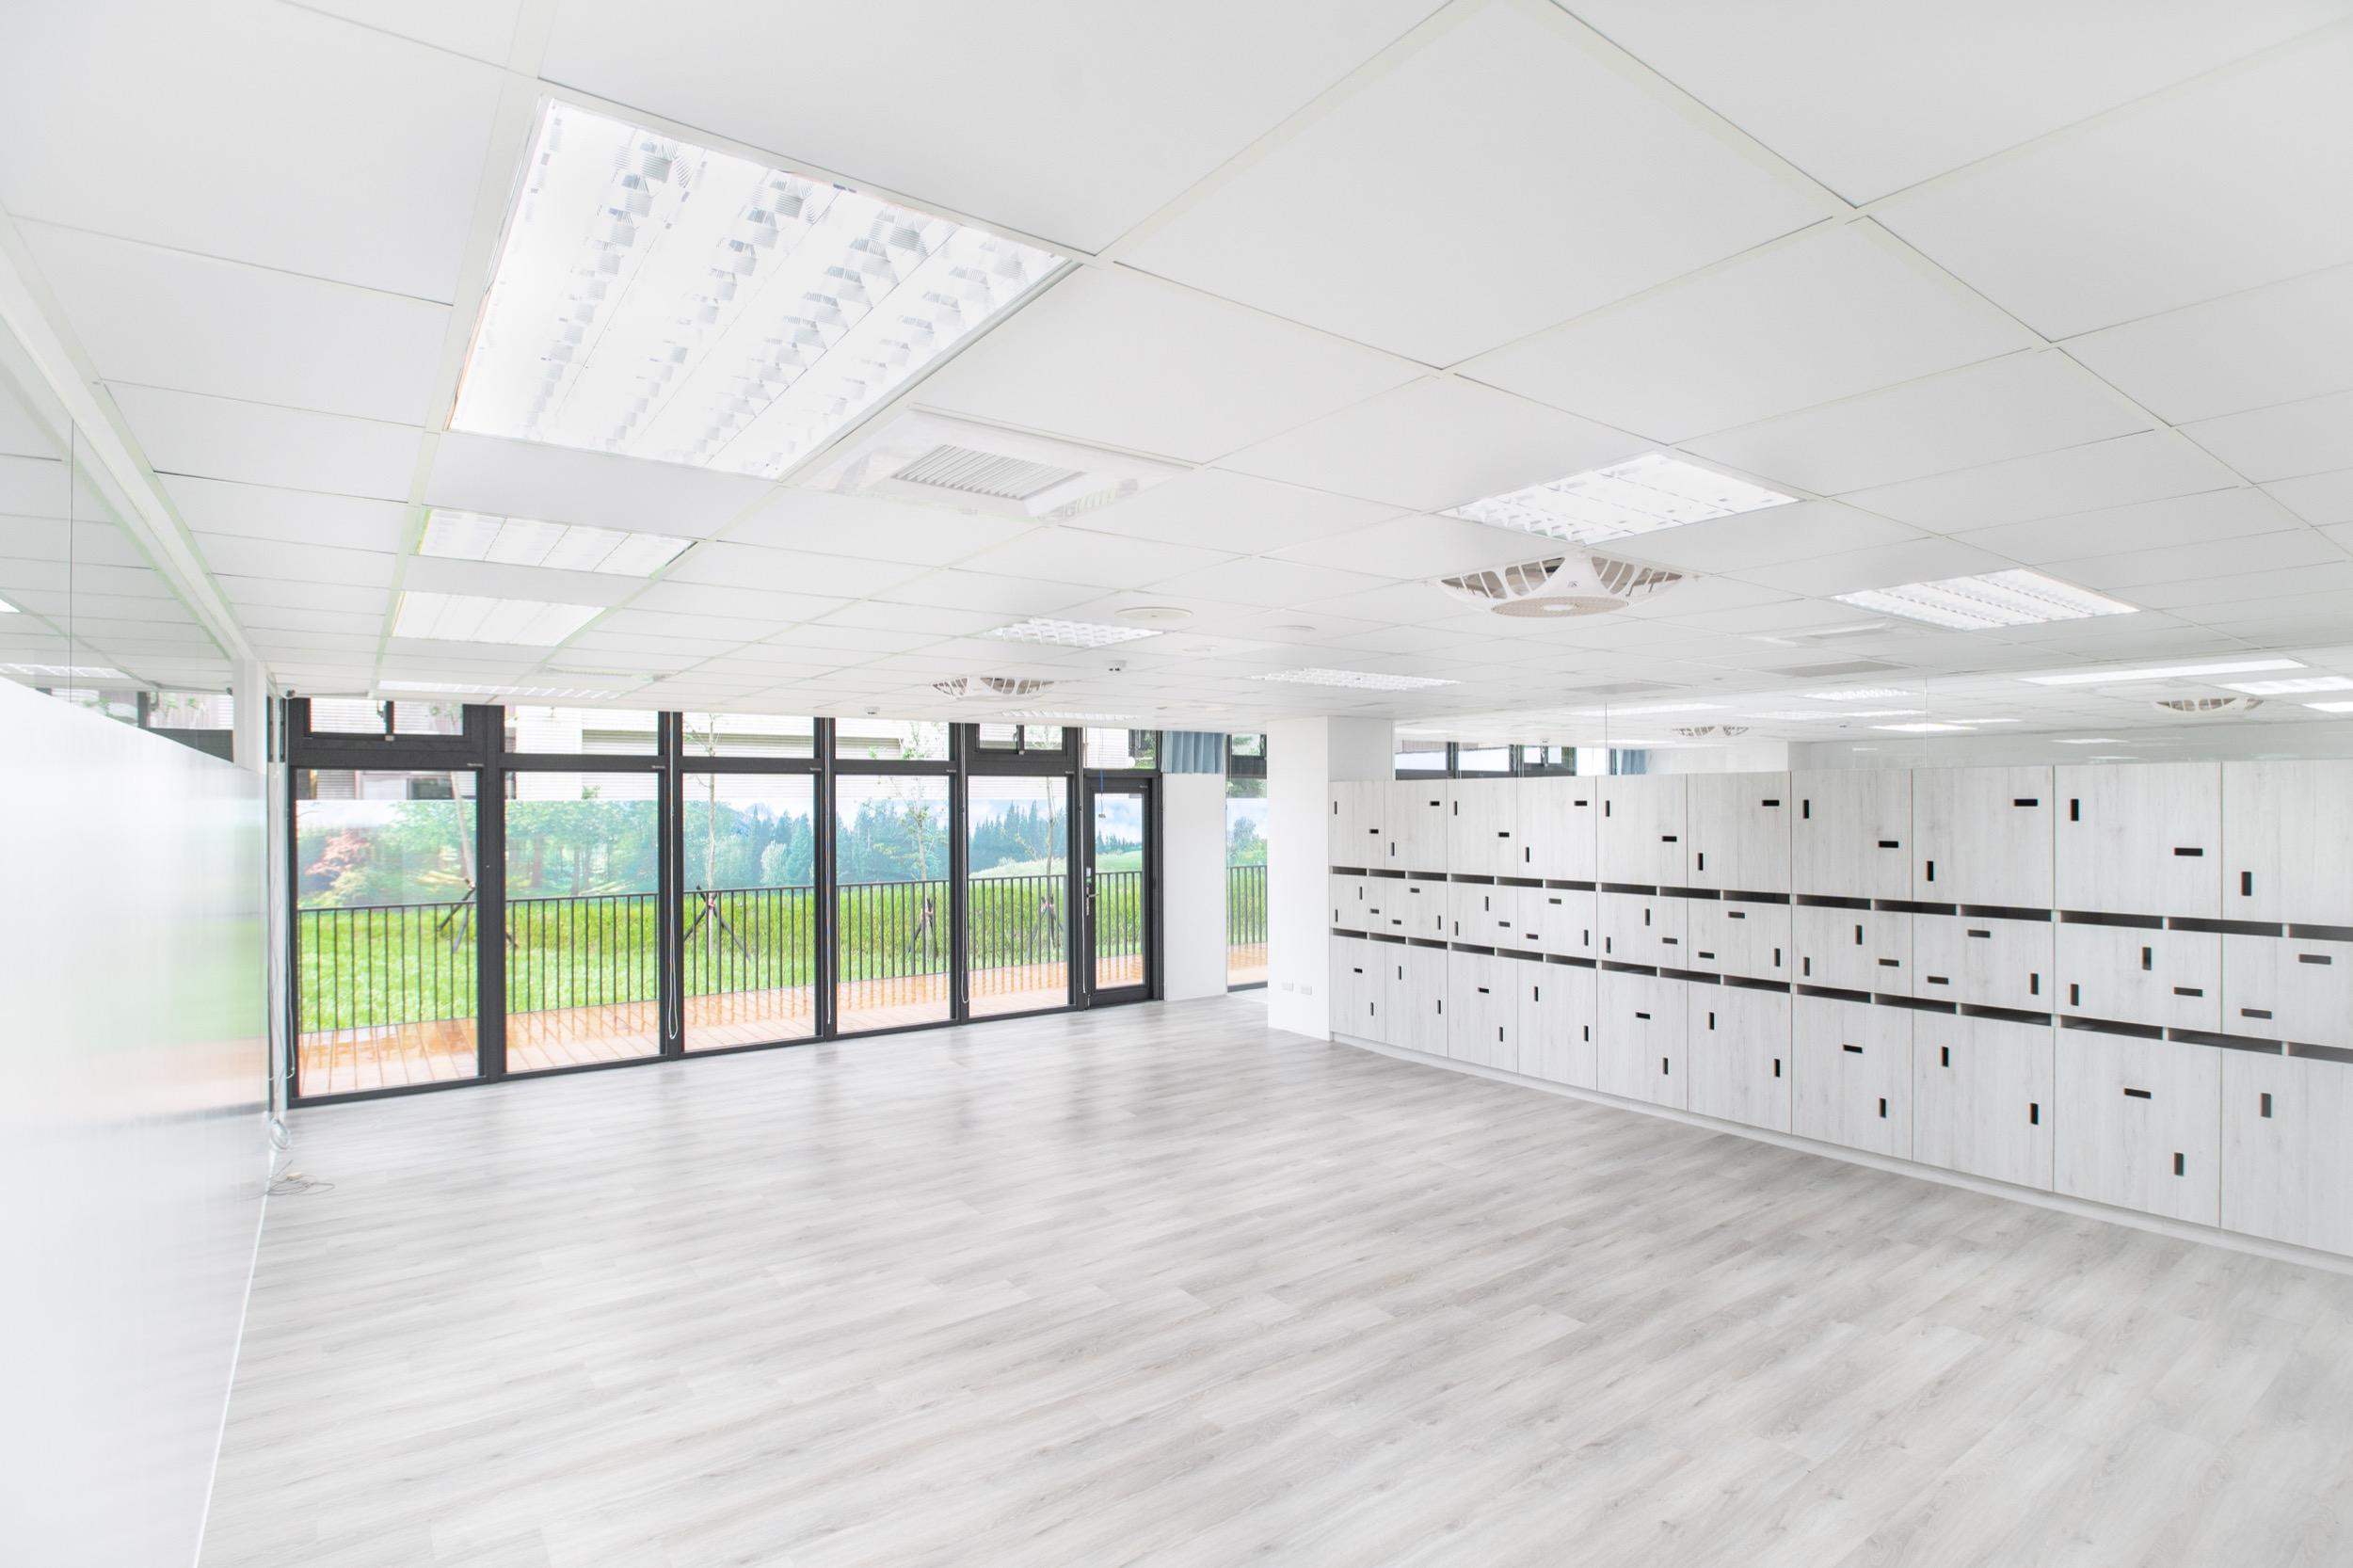 德築-DEZU-project-JSkids-architecture-building-interior-66